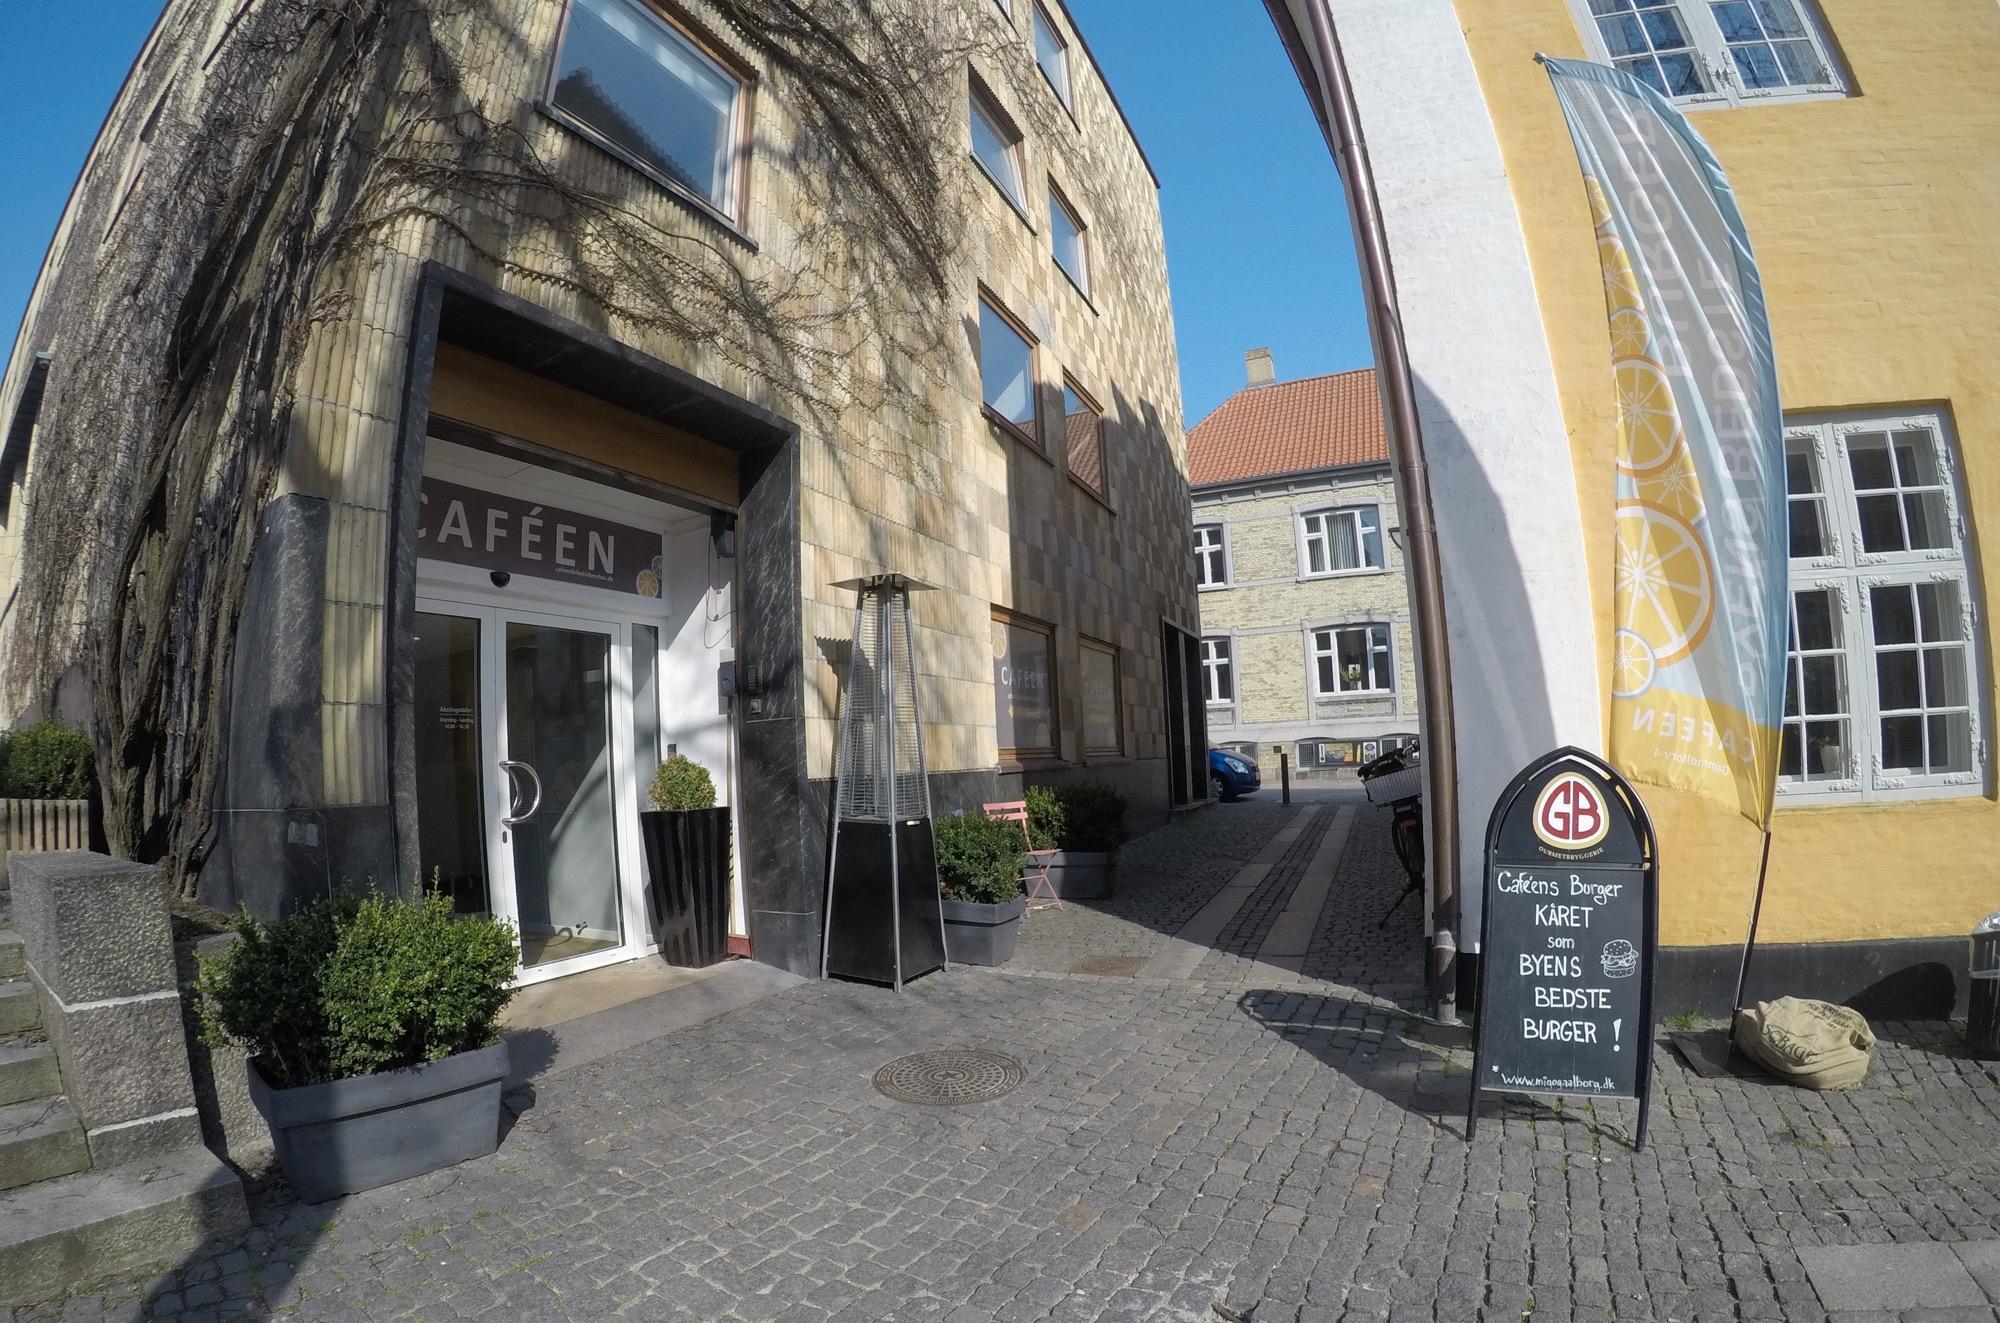 Caféen på Gammeltorv aalborg menukort dinnerlust gl torv book bord reserver åbningstider